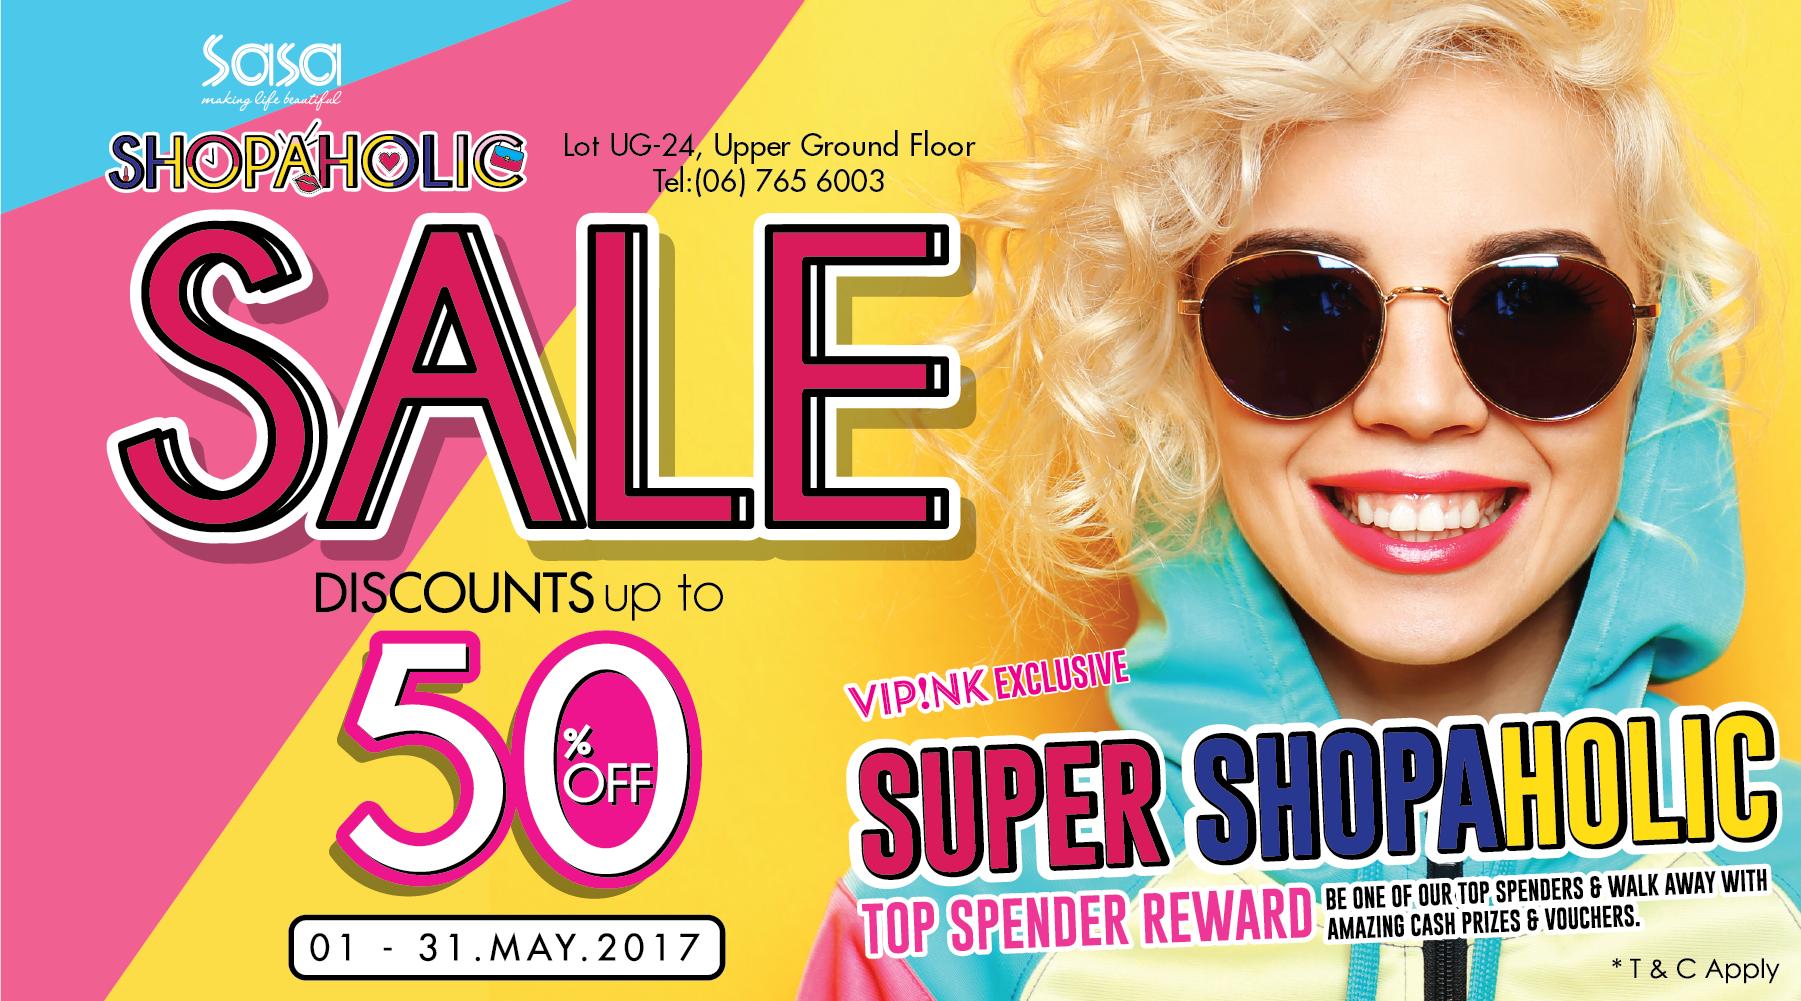 Sa Sa Shopaholic Sale